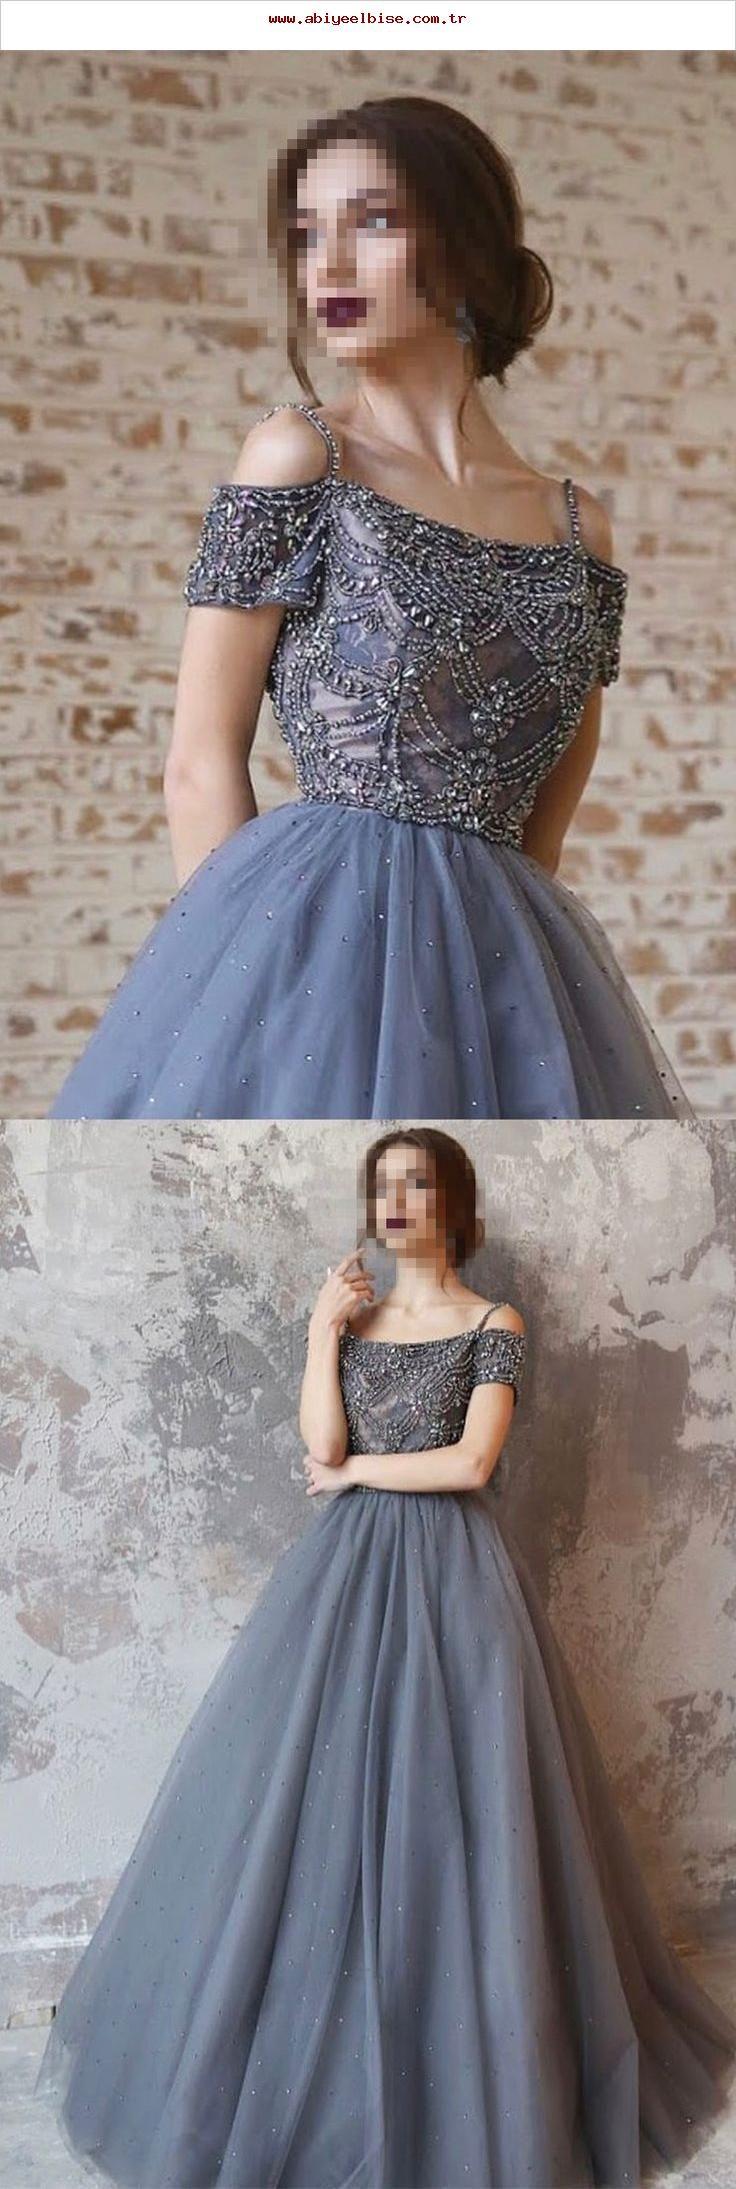 12 Abendkleid, langes Abendkleid, graues Abendkleid, Abendkleid